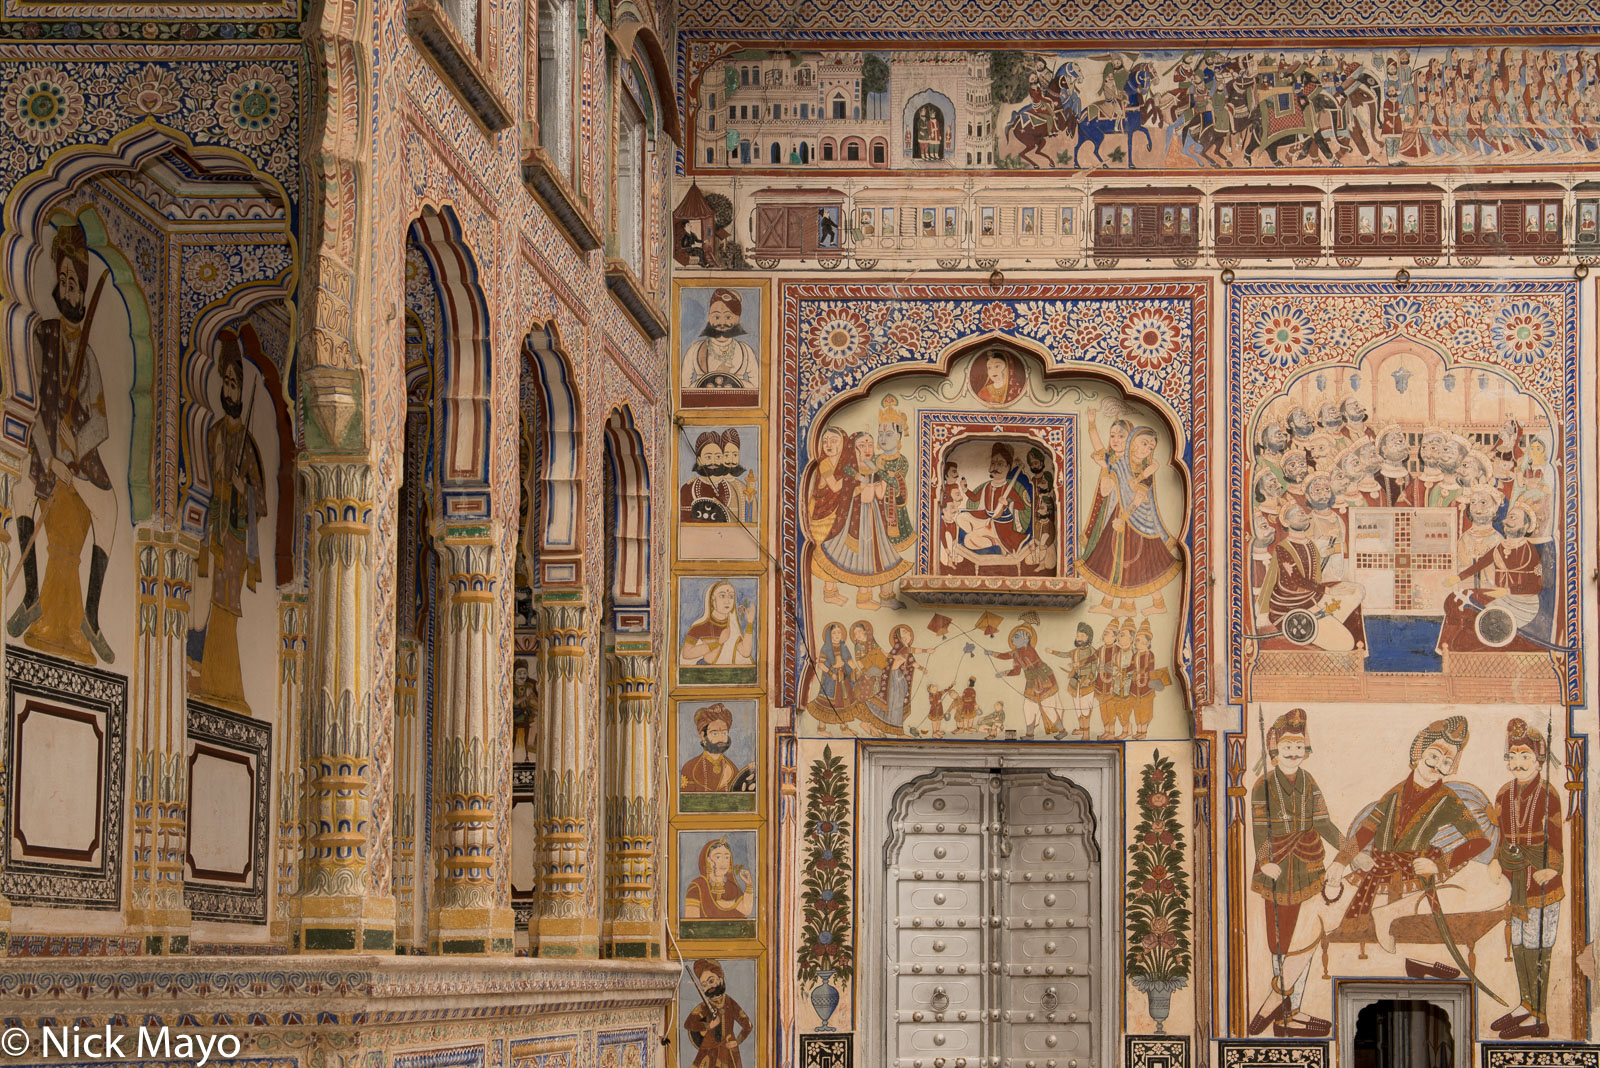 India, Mural, Rajasthan, photo